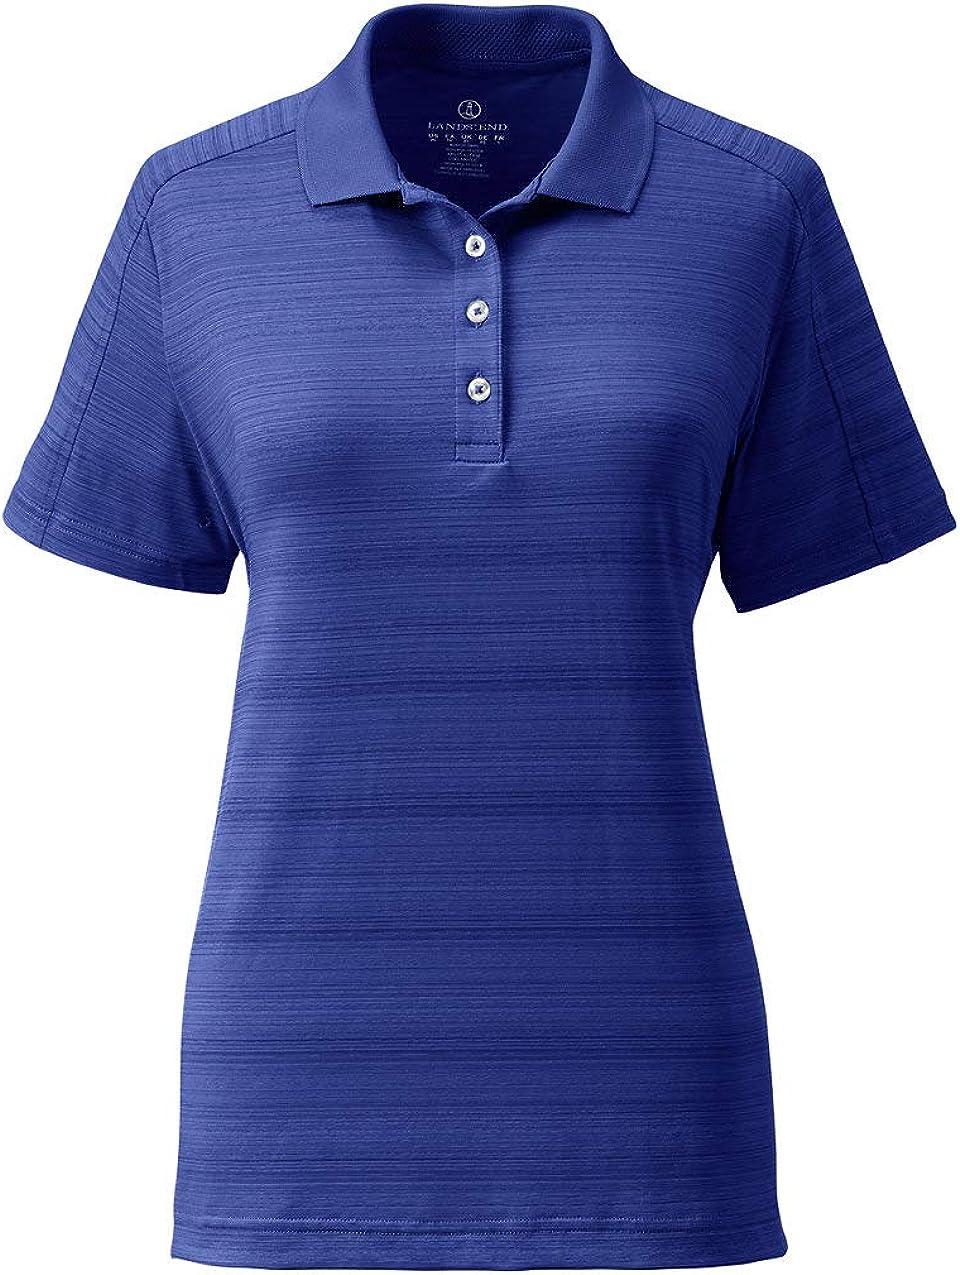 Lands End Womens Short Sleeve Tonal Stripe Polo